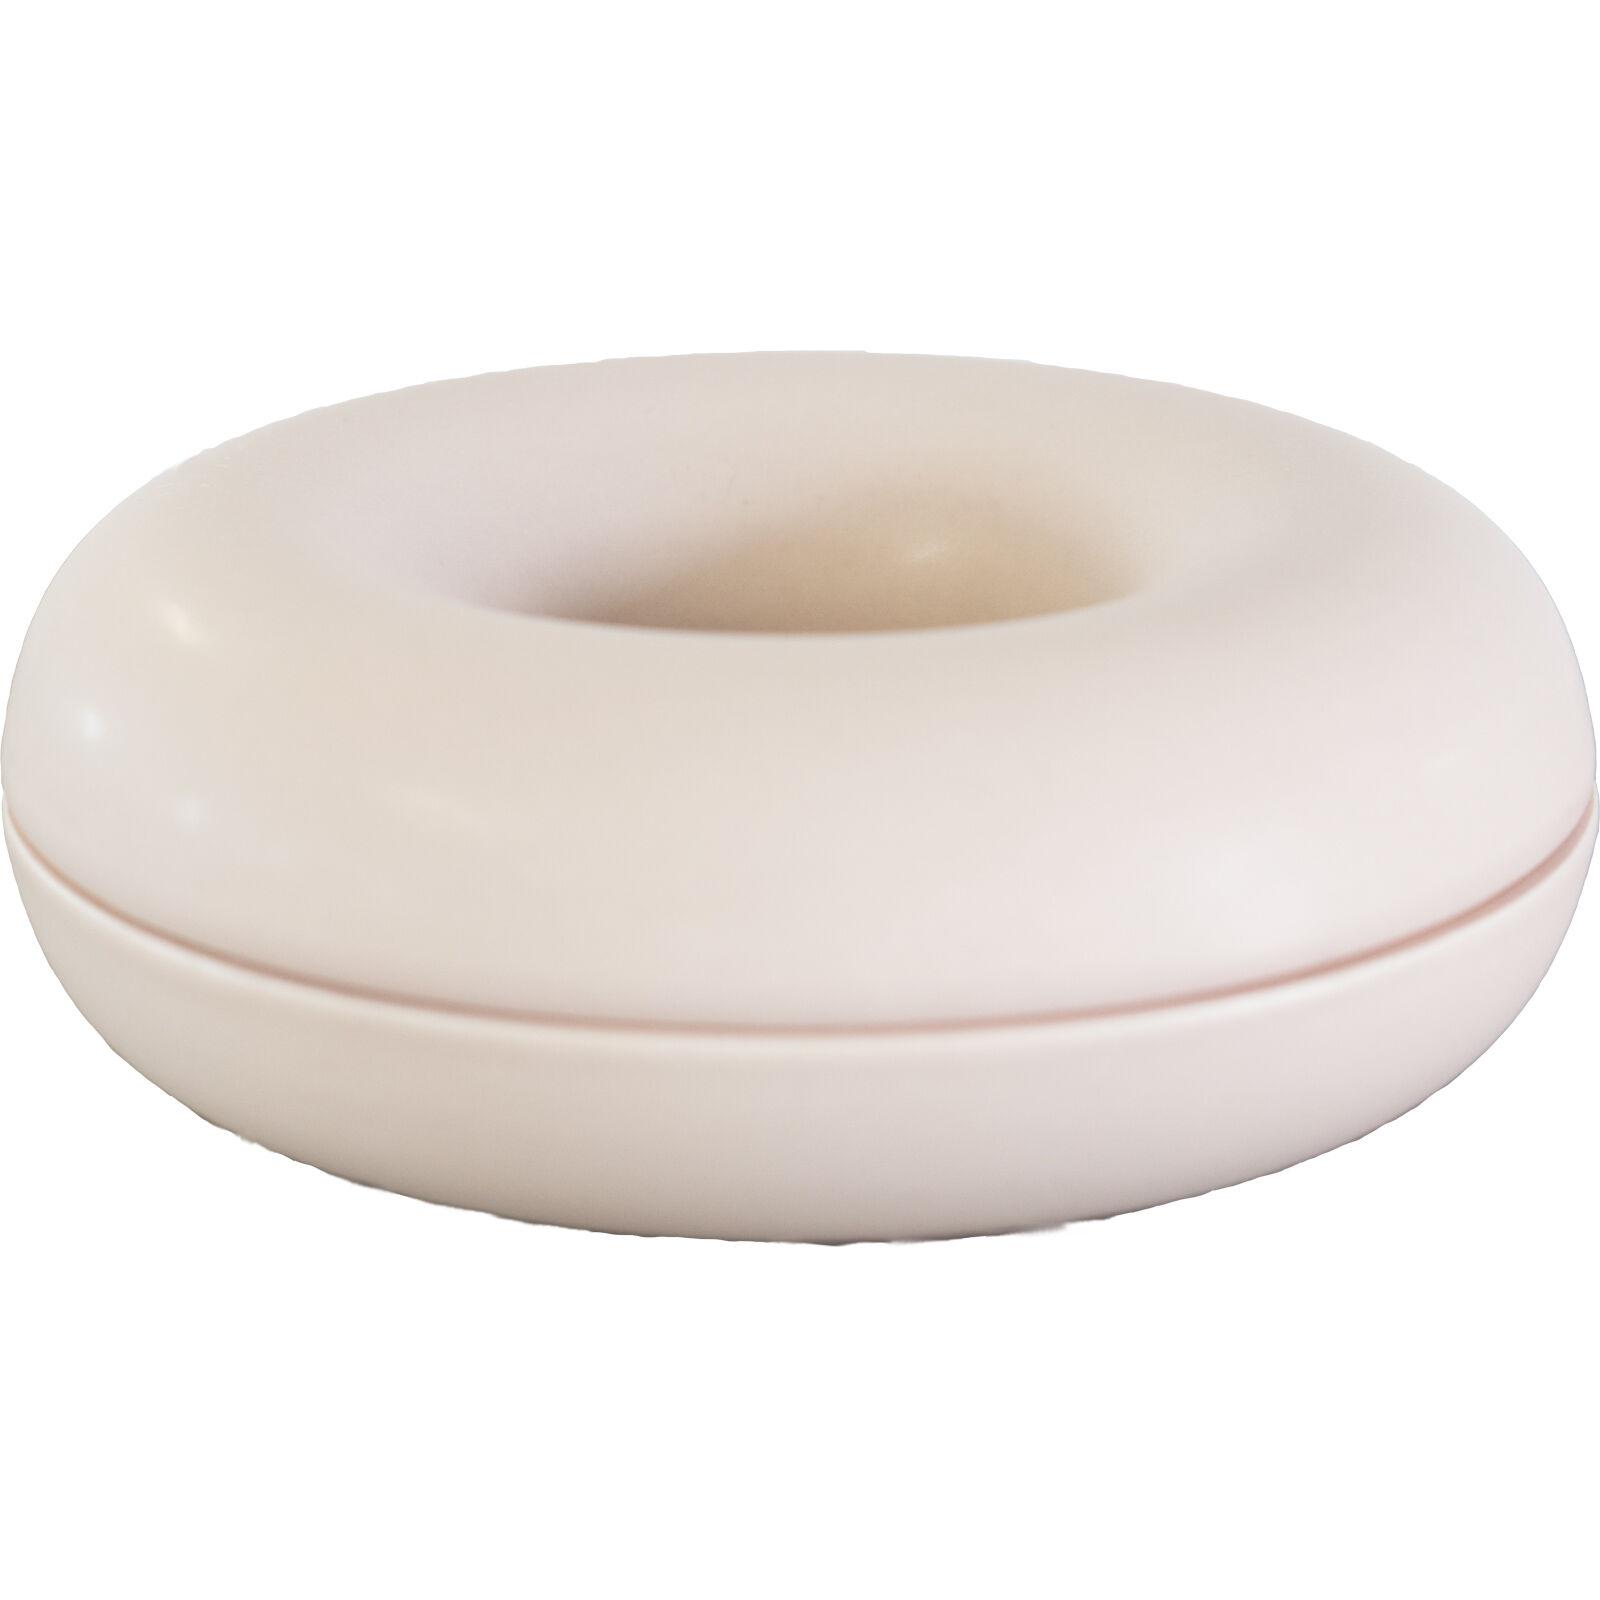 DBKD Donut Kulho, Nude